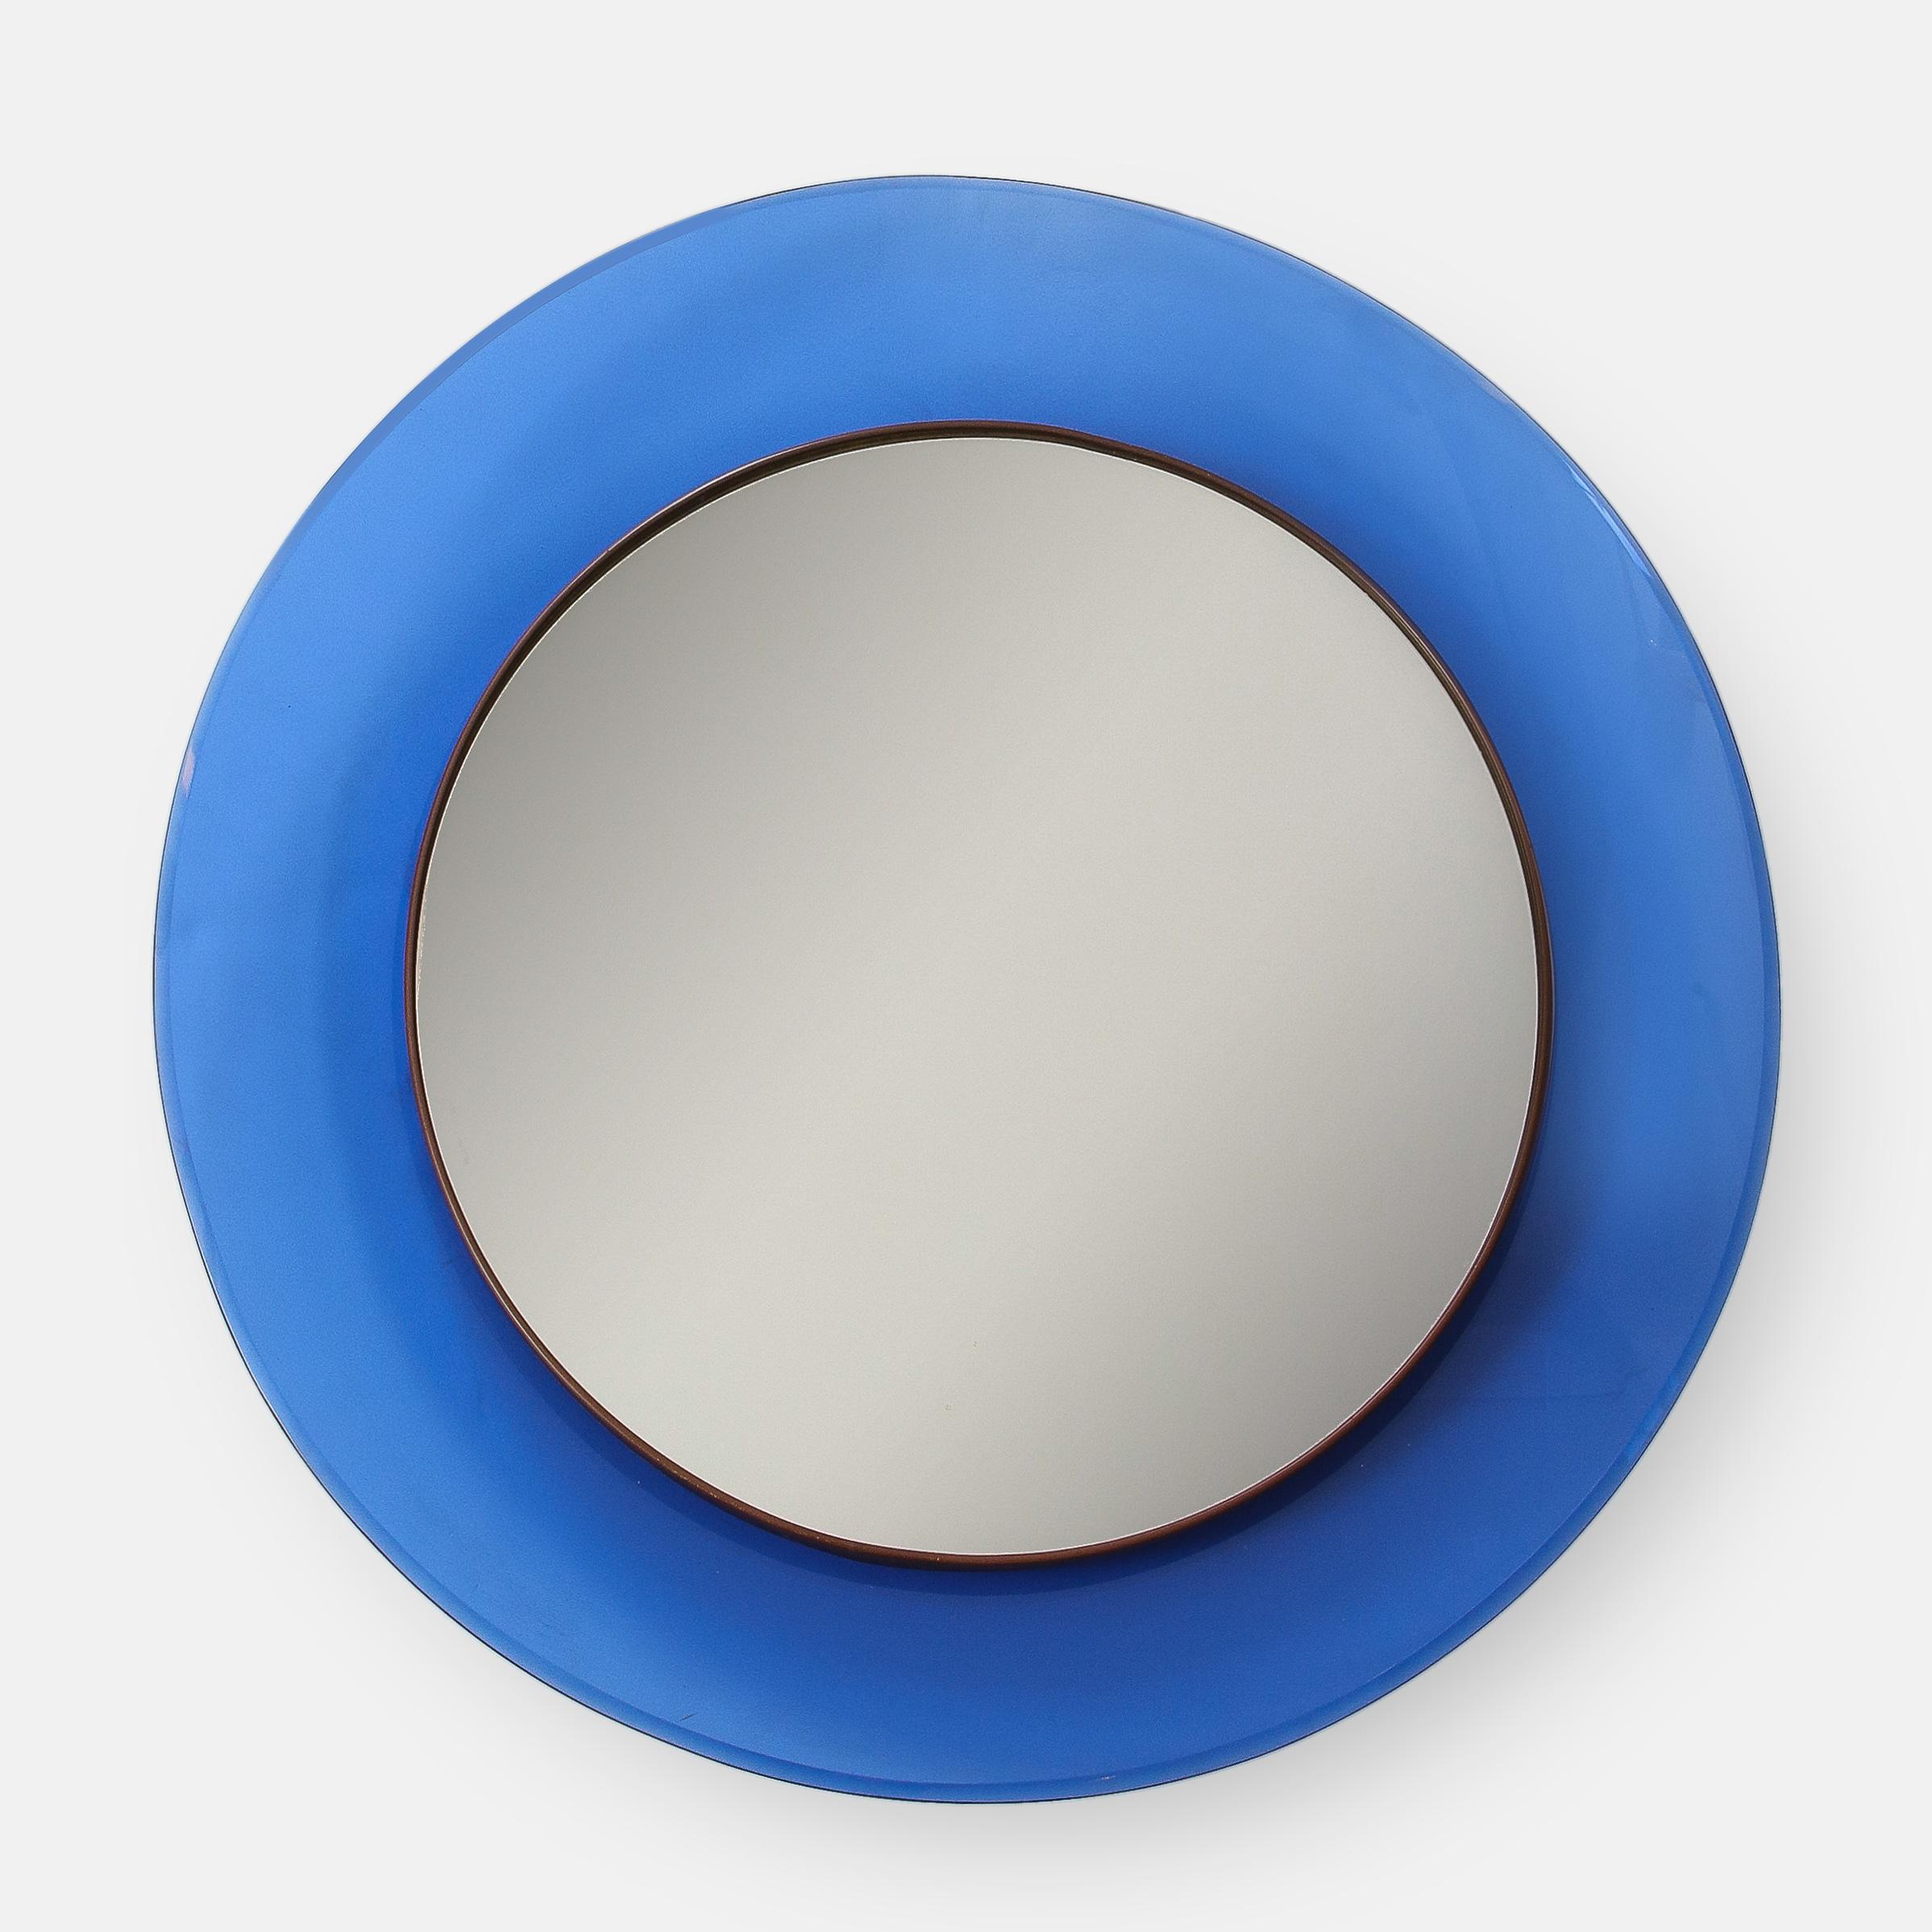 Mirror Model 1669 by Max Ingrand for Fontana Arte | soyun k.